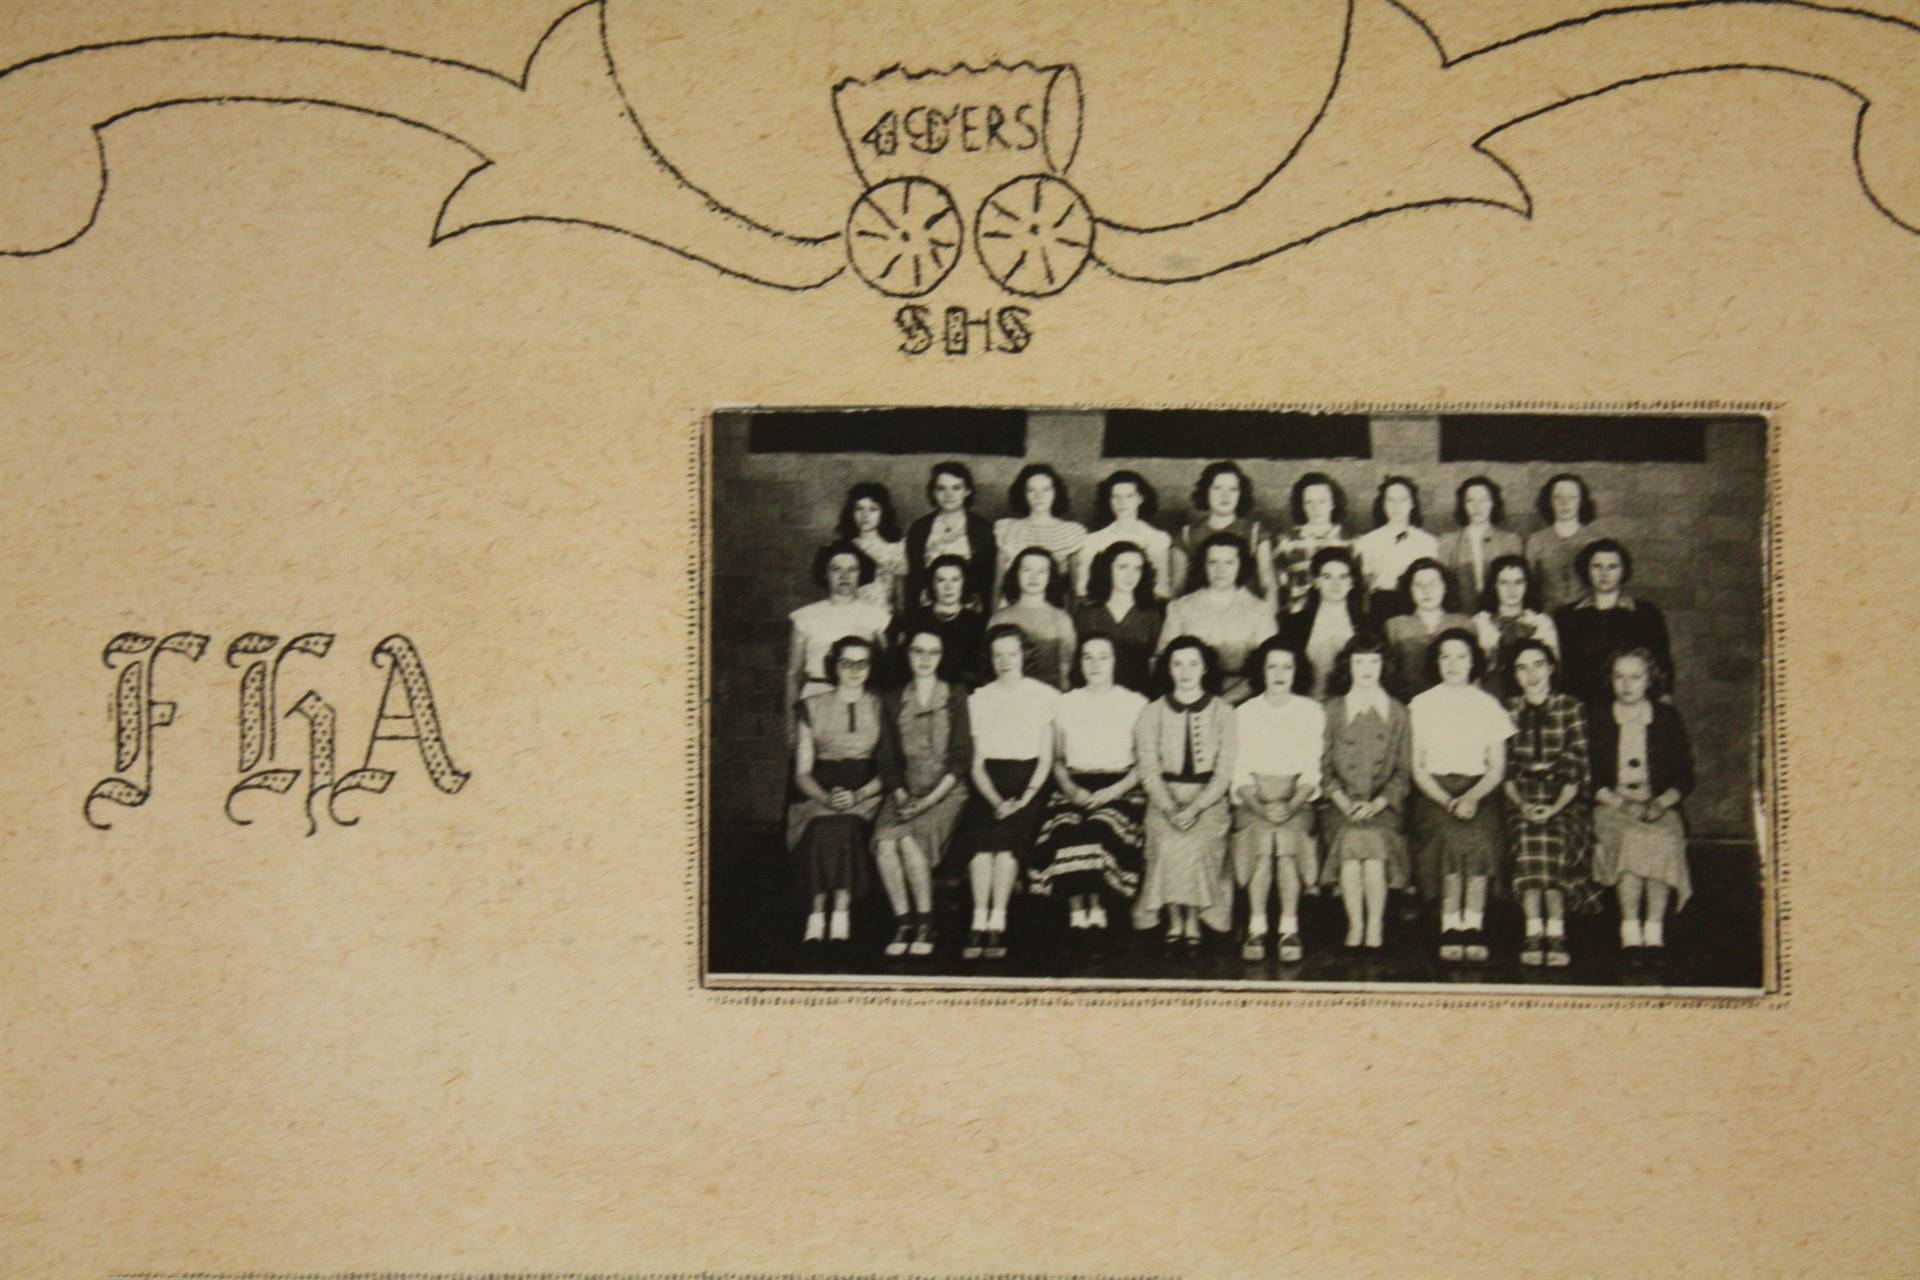 1949 FHA